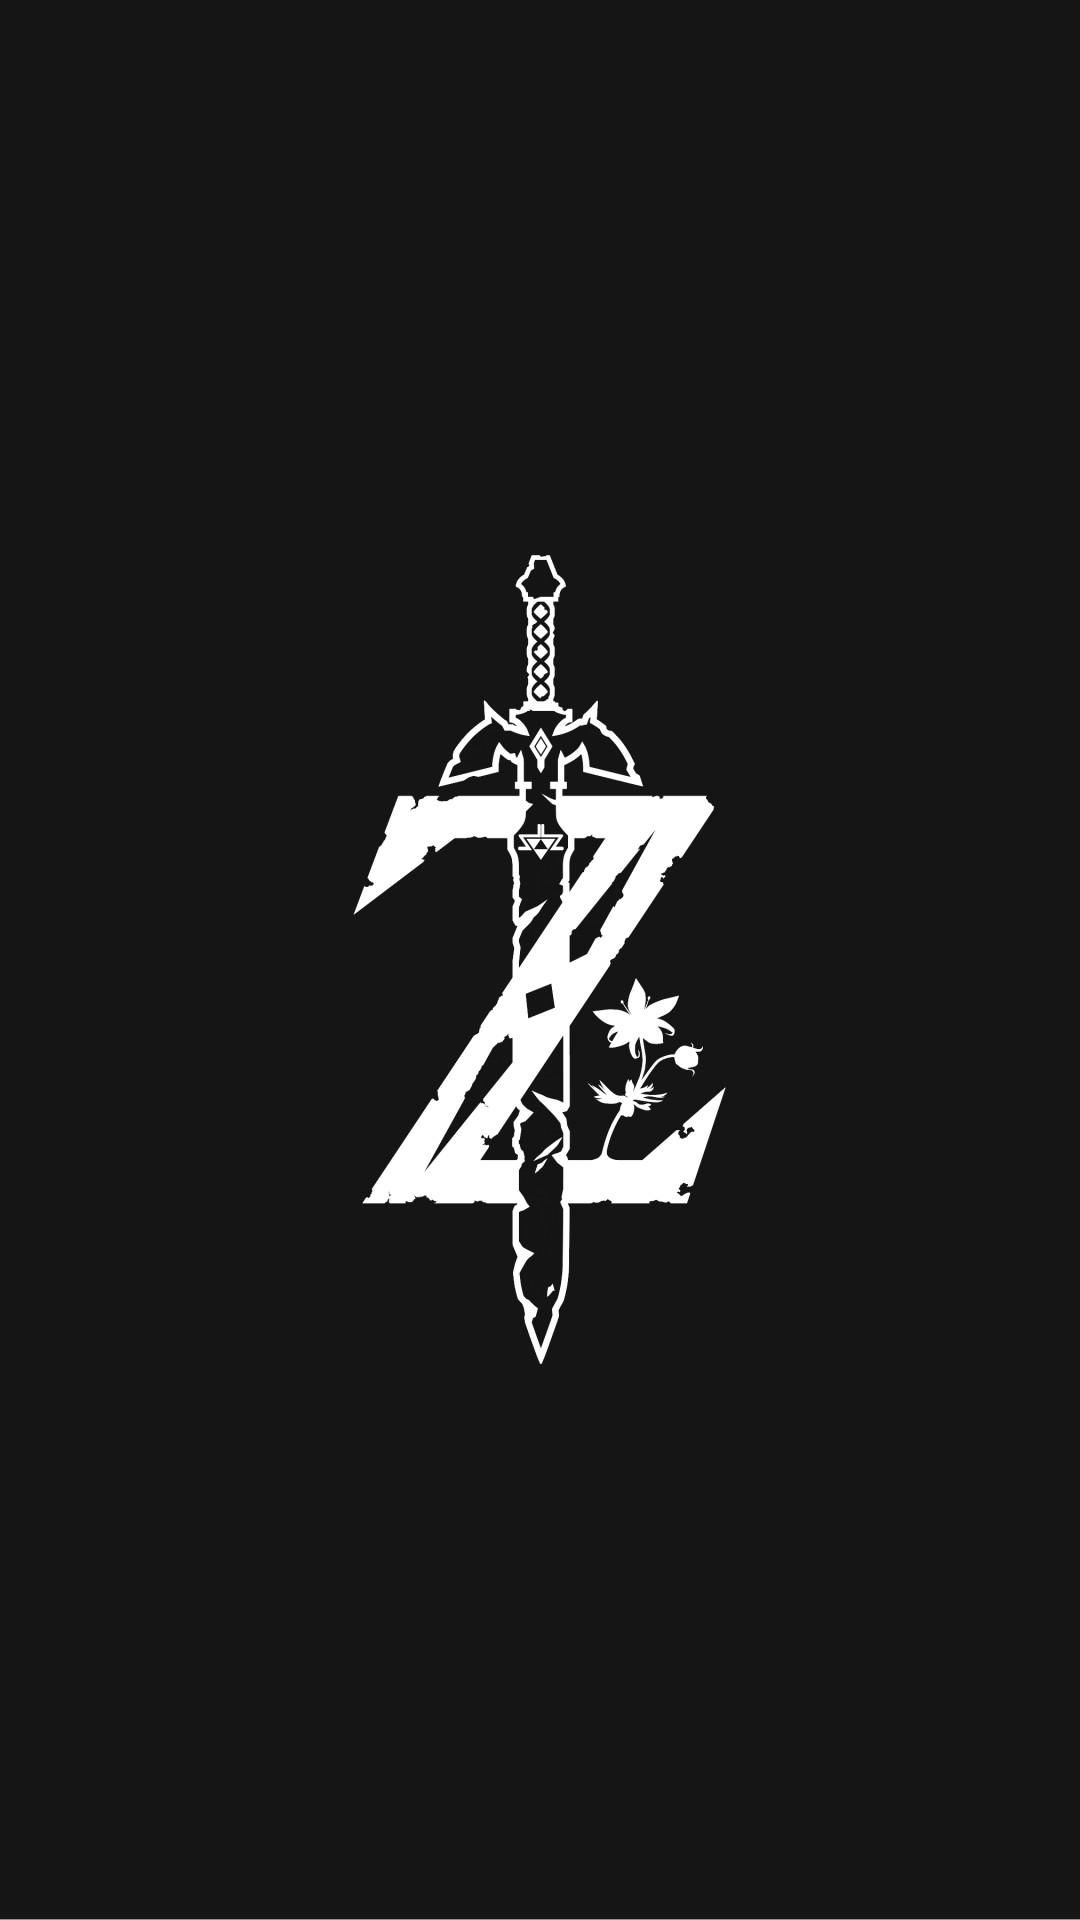 … download the legend of zelda logo wallpapers for iphone …